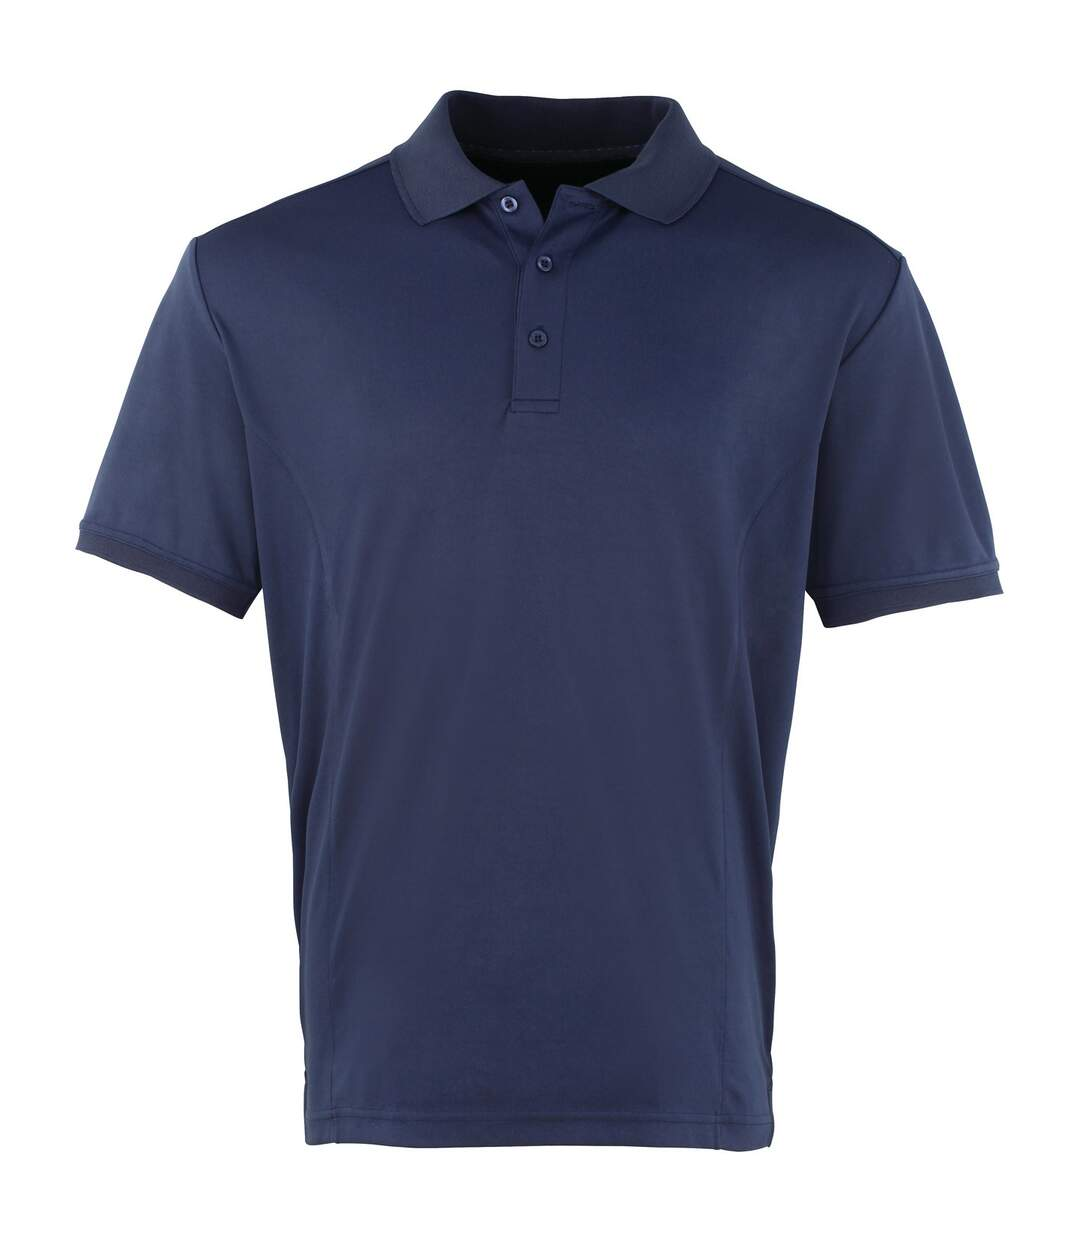 Premier Mens Coolchecker Pique Short Sleeve Polo T-Shirt (Sapphire) - UTRW4401